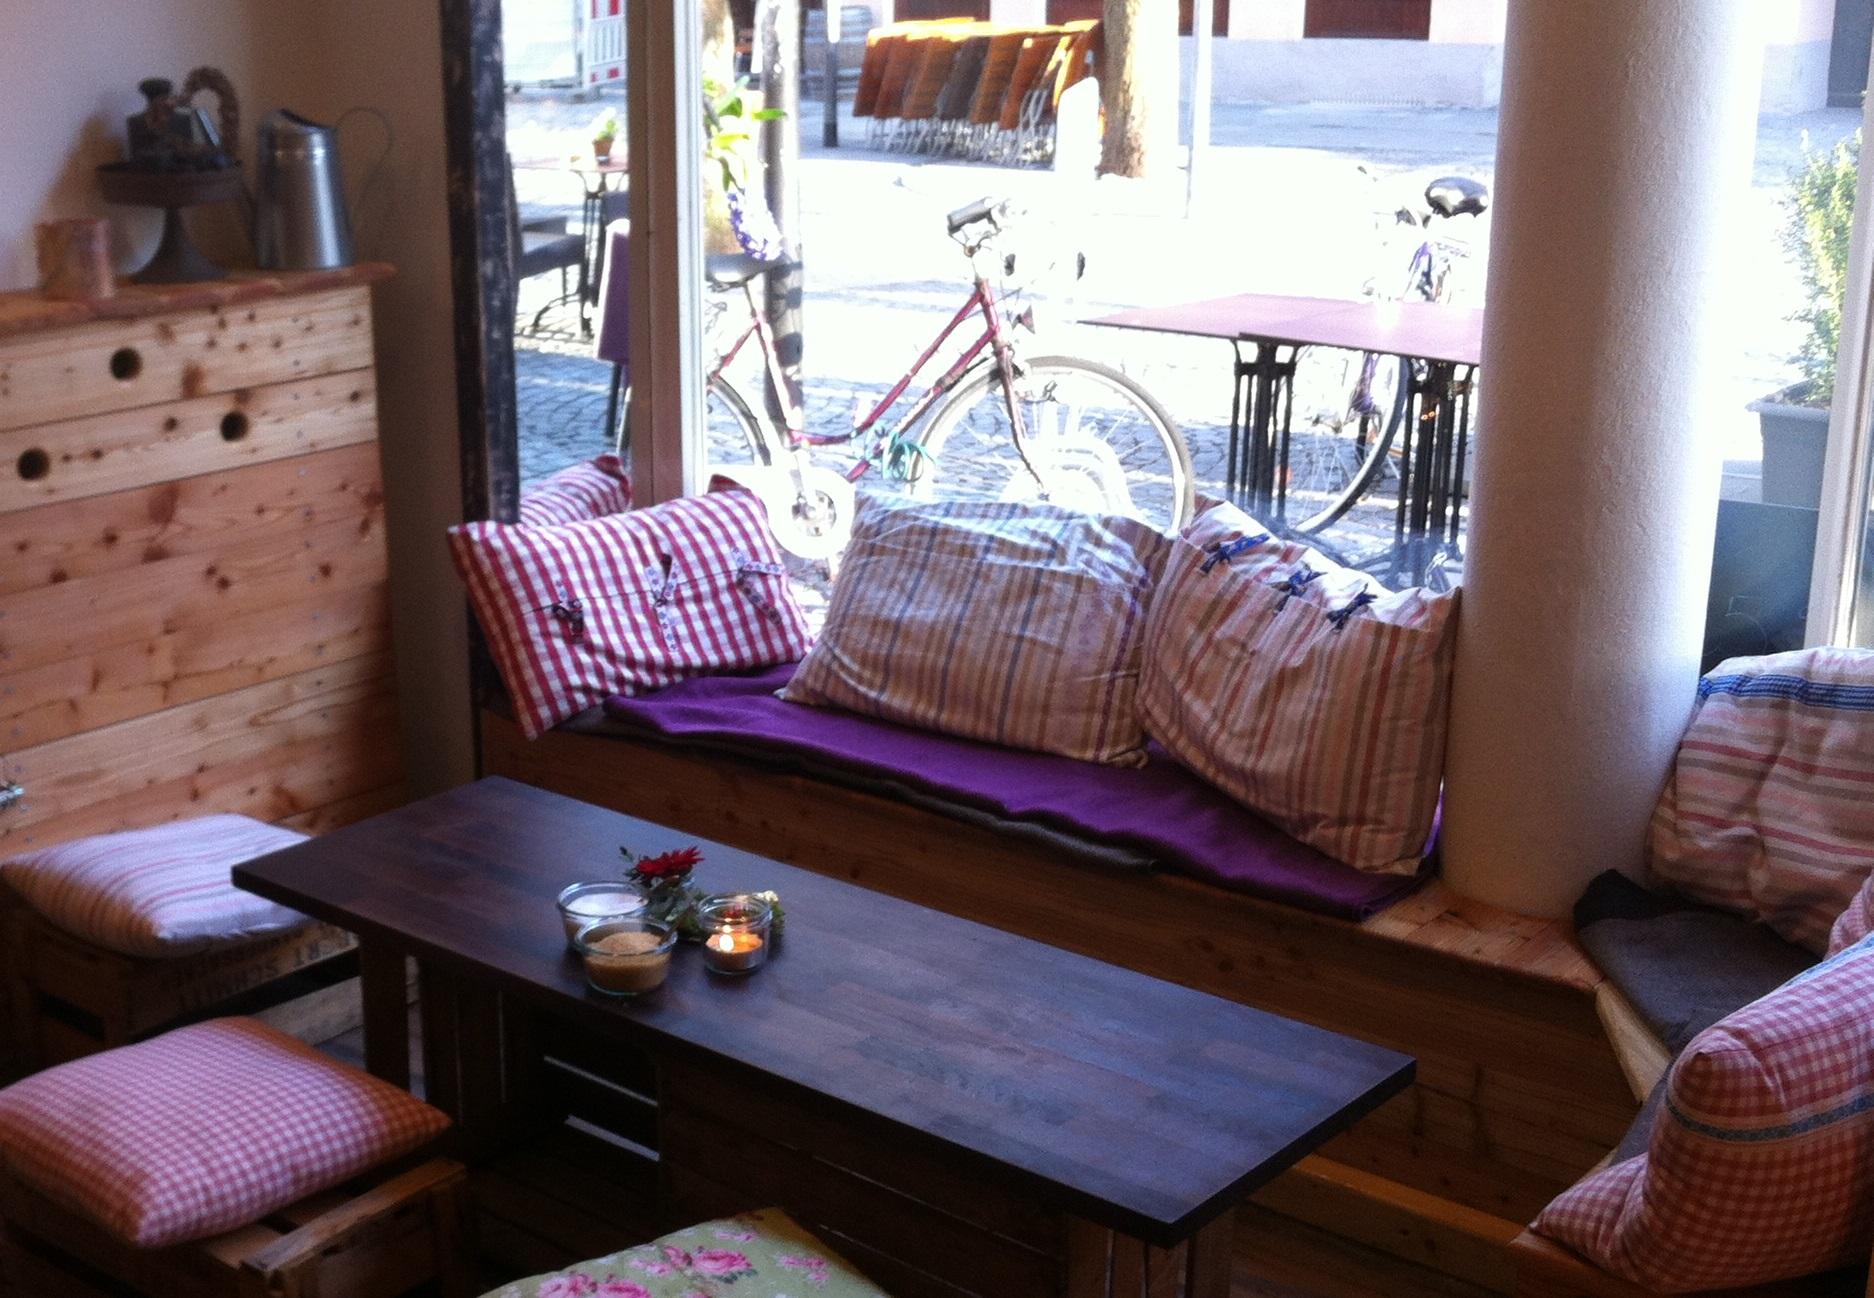 Kafeeküche Sitzecke